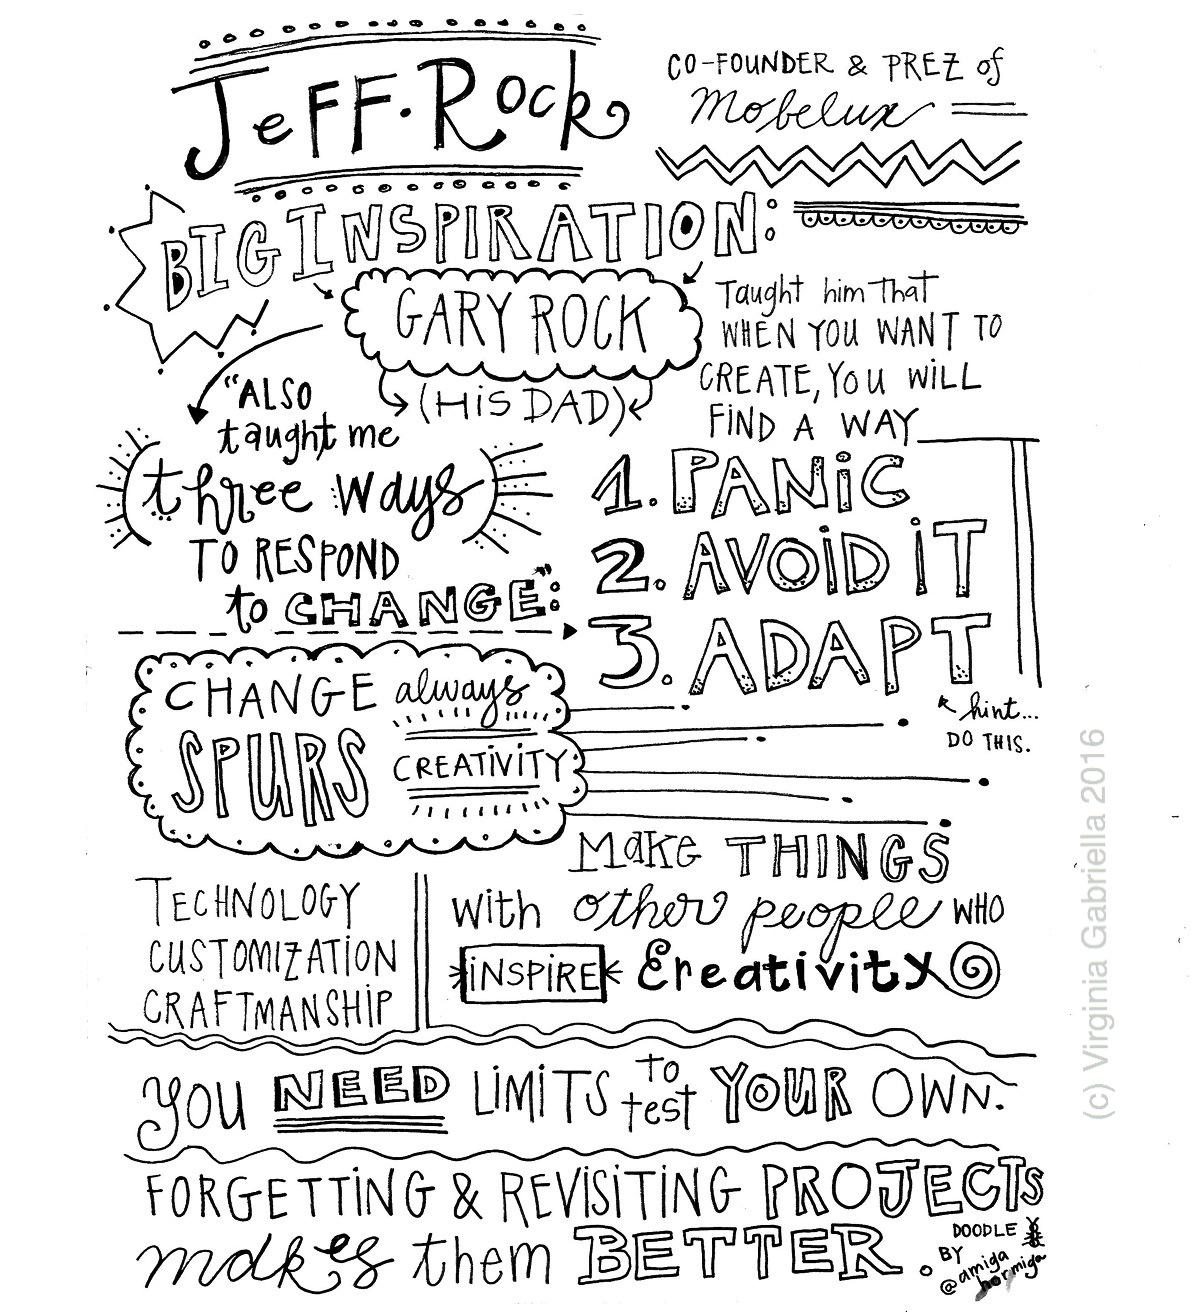 JeffRock.jpg